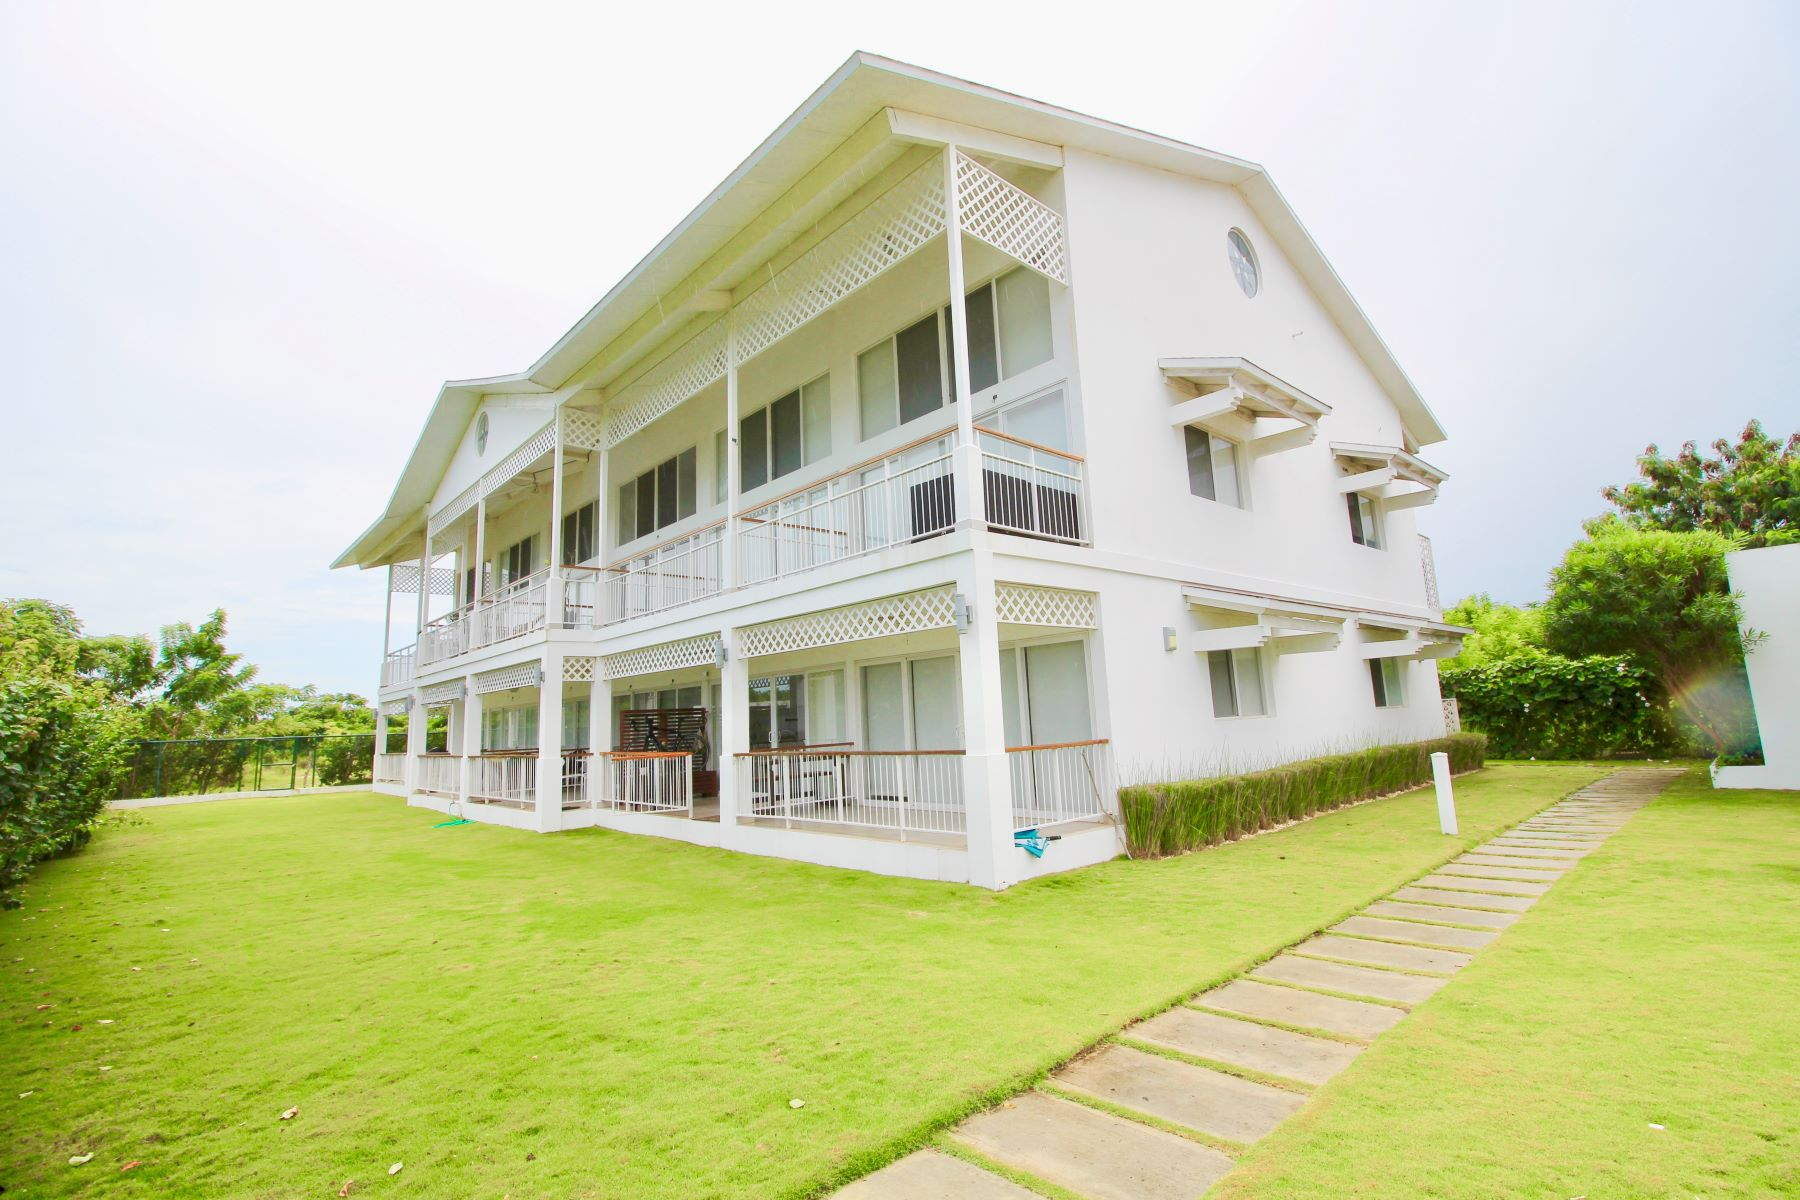 Apartments for Active at PH Kite Village - Punta Chame Punta Chame, Cities In Panama Panama